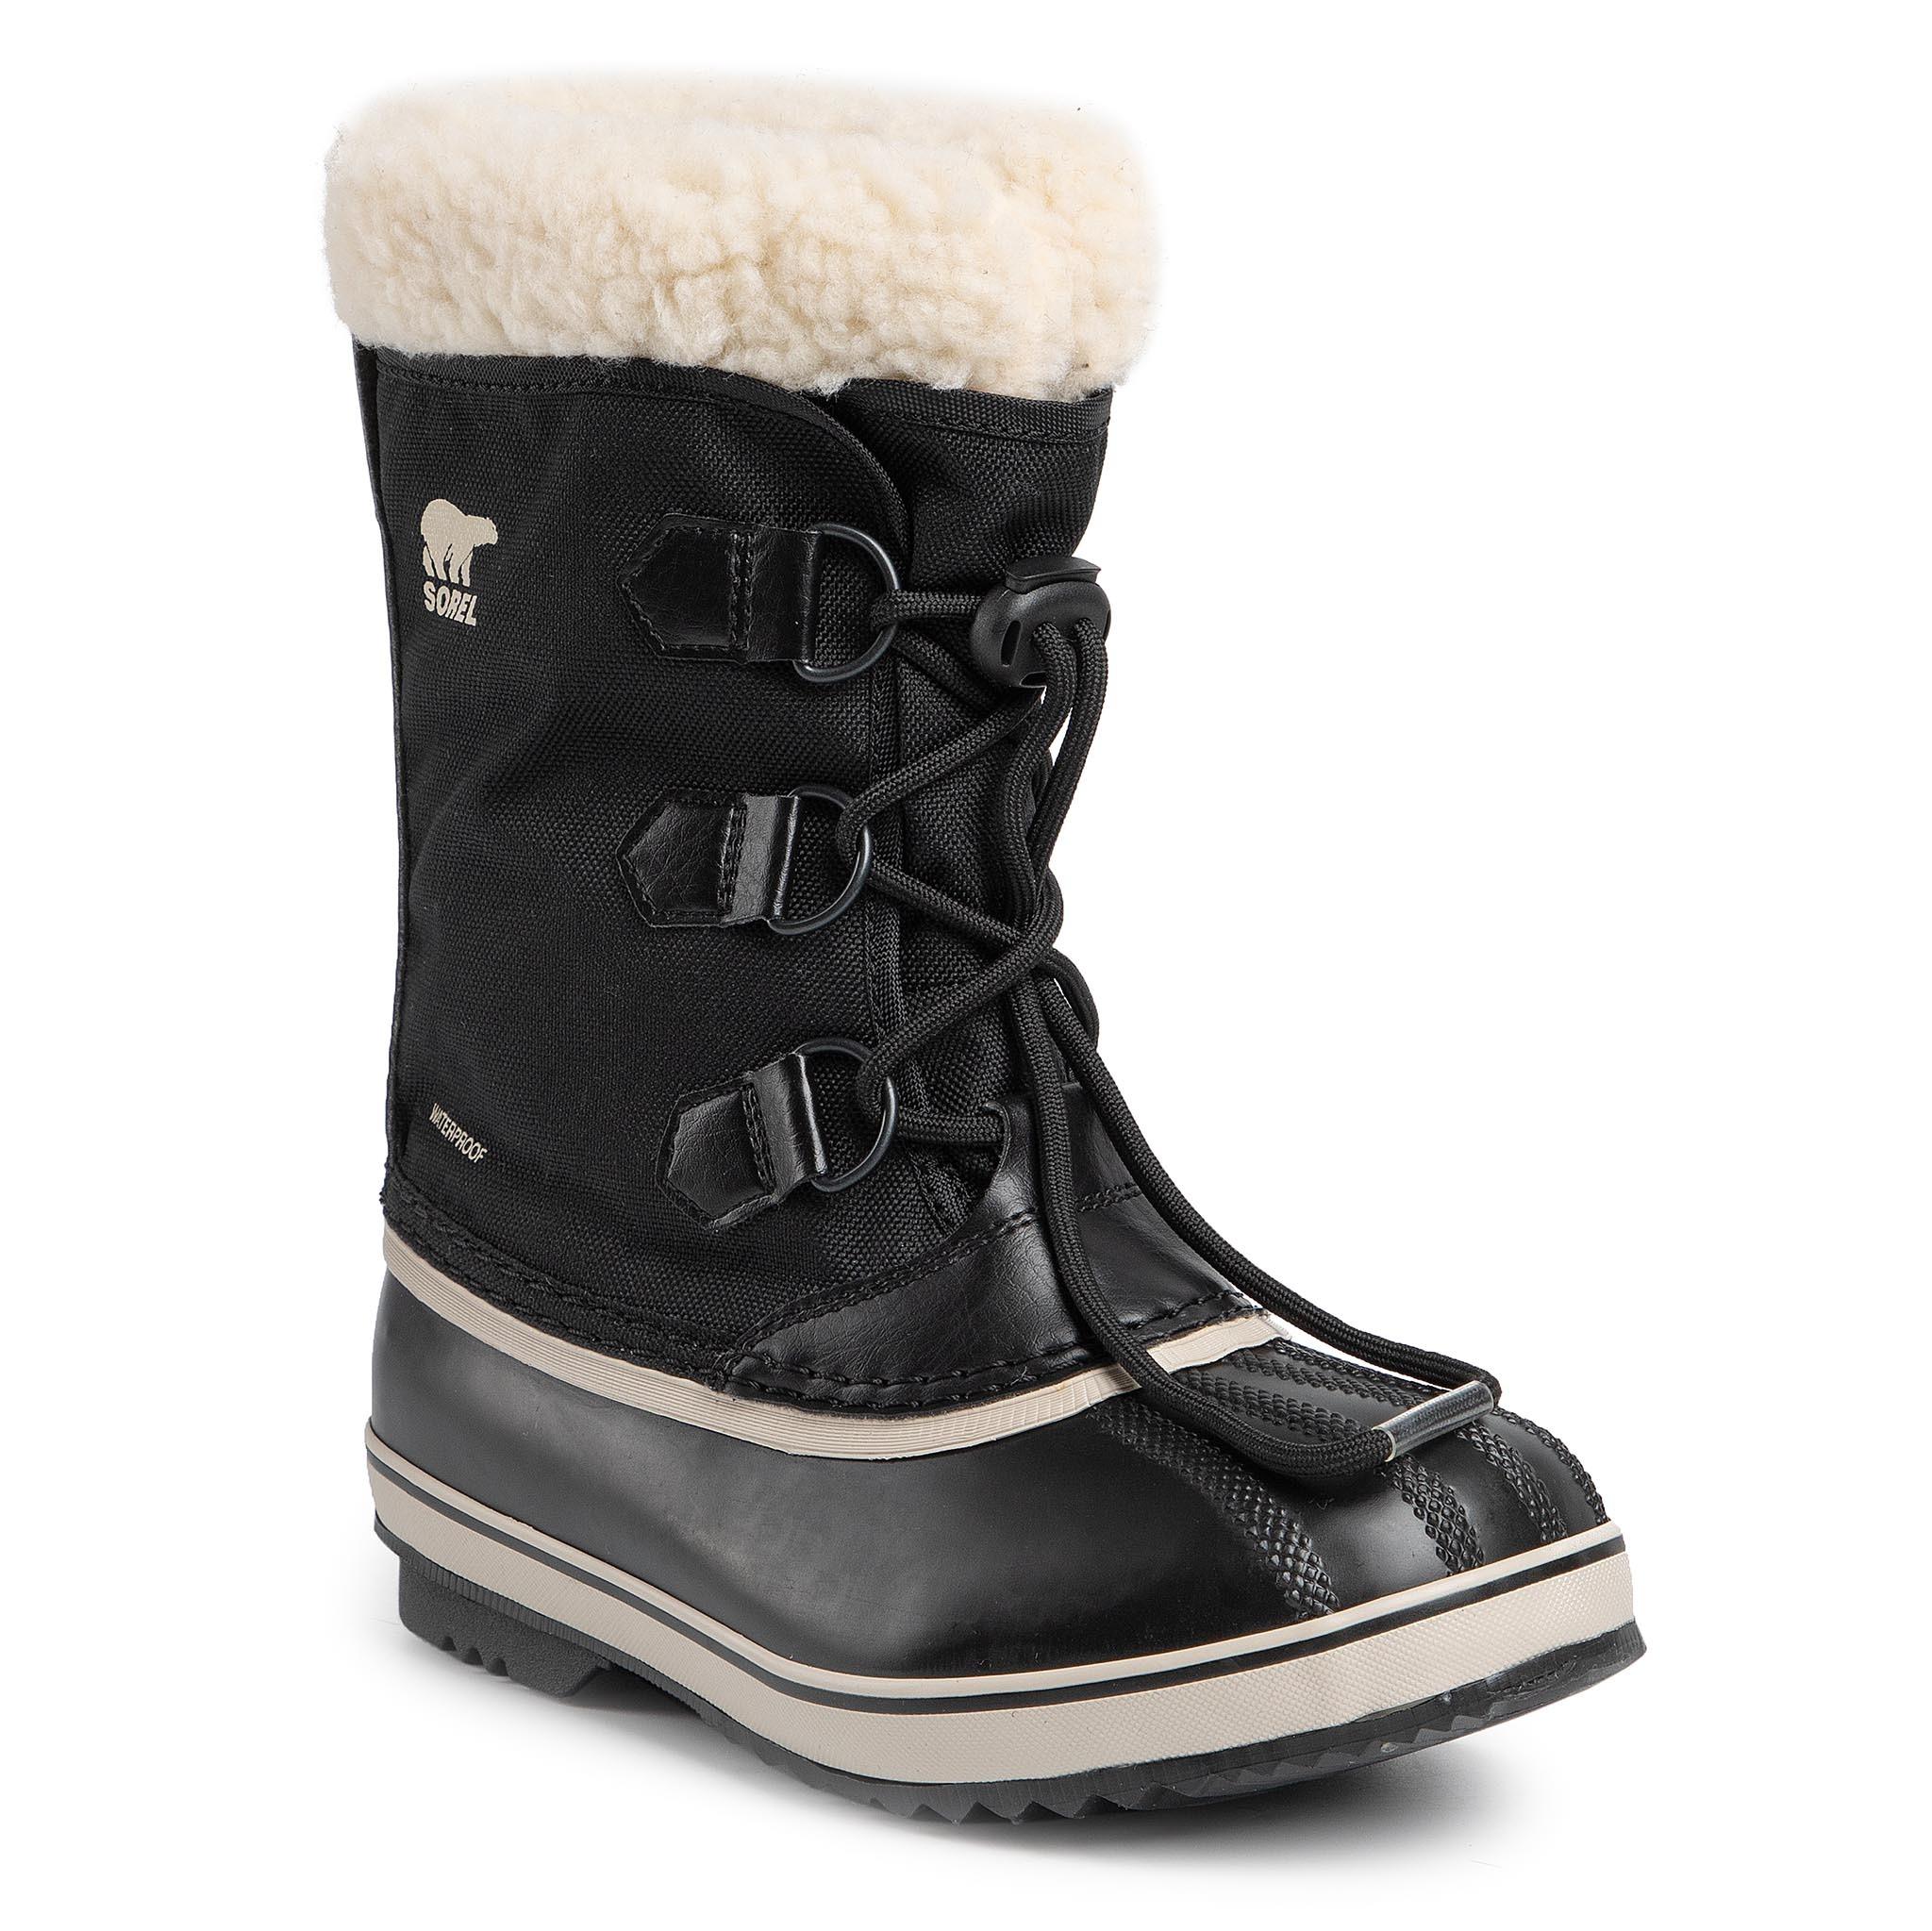 Cizme de zăpadă SOREL - Yoot Pac Nylon NY1962 Black 010